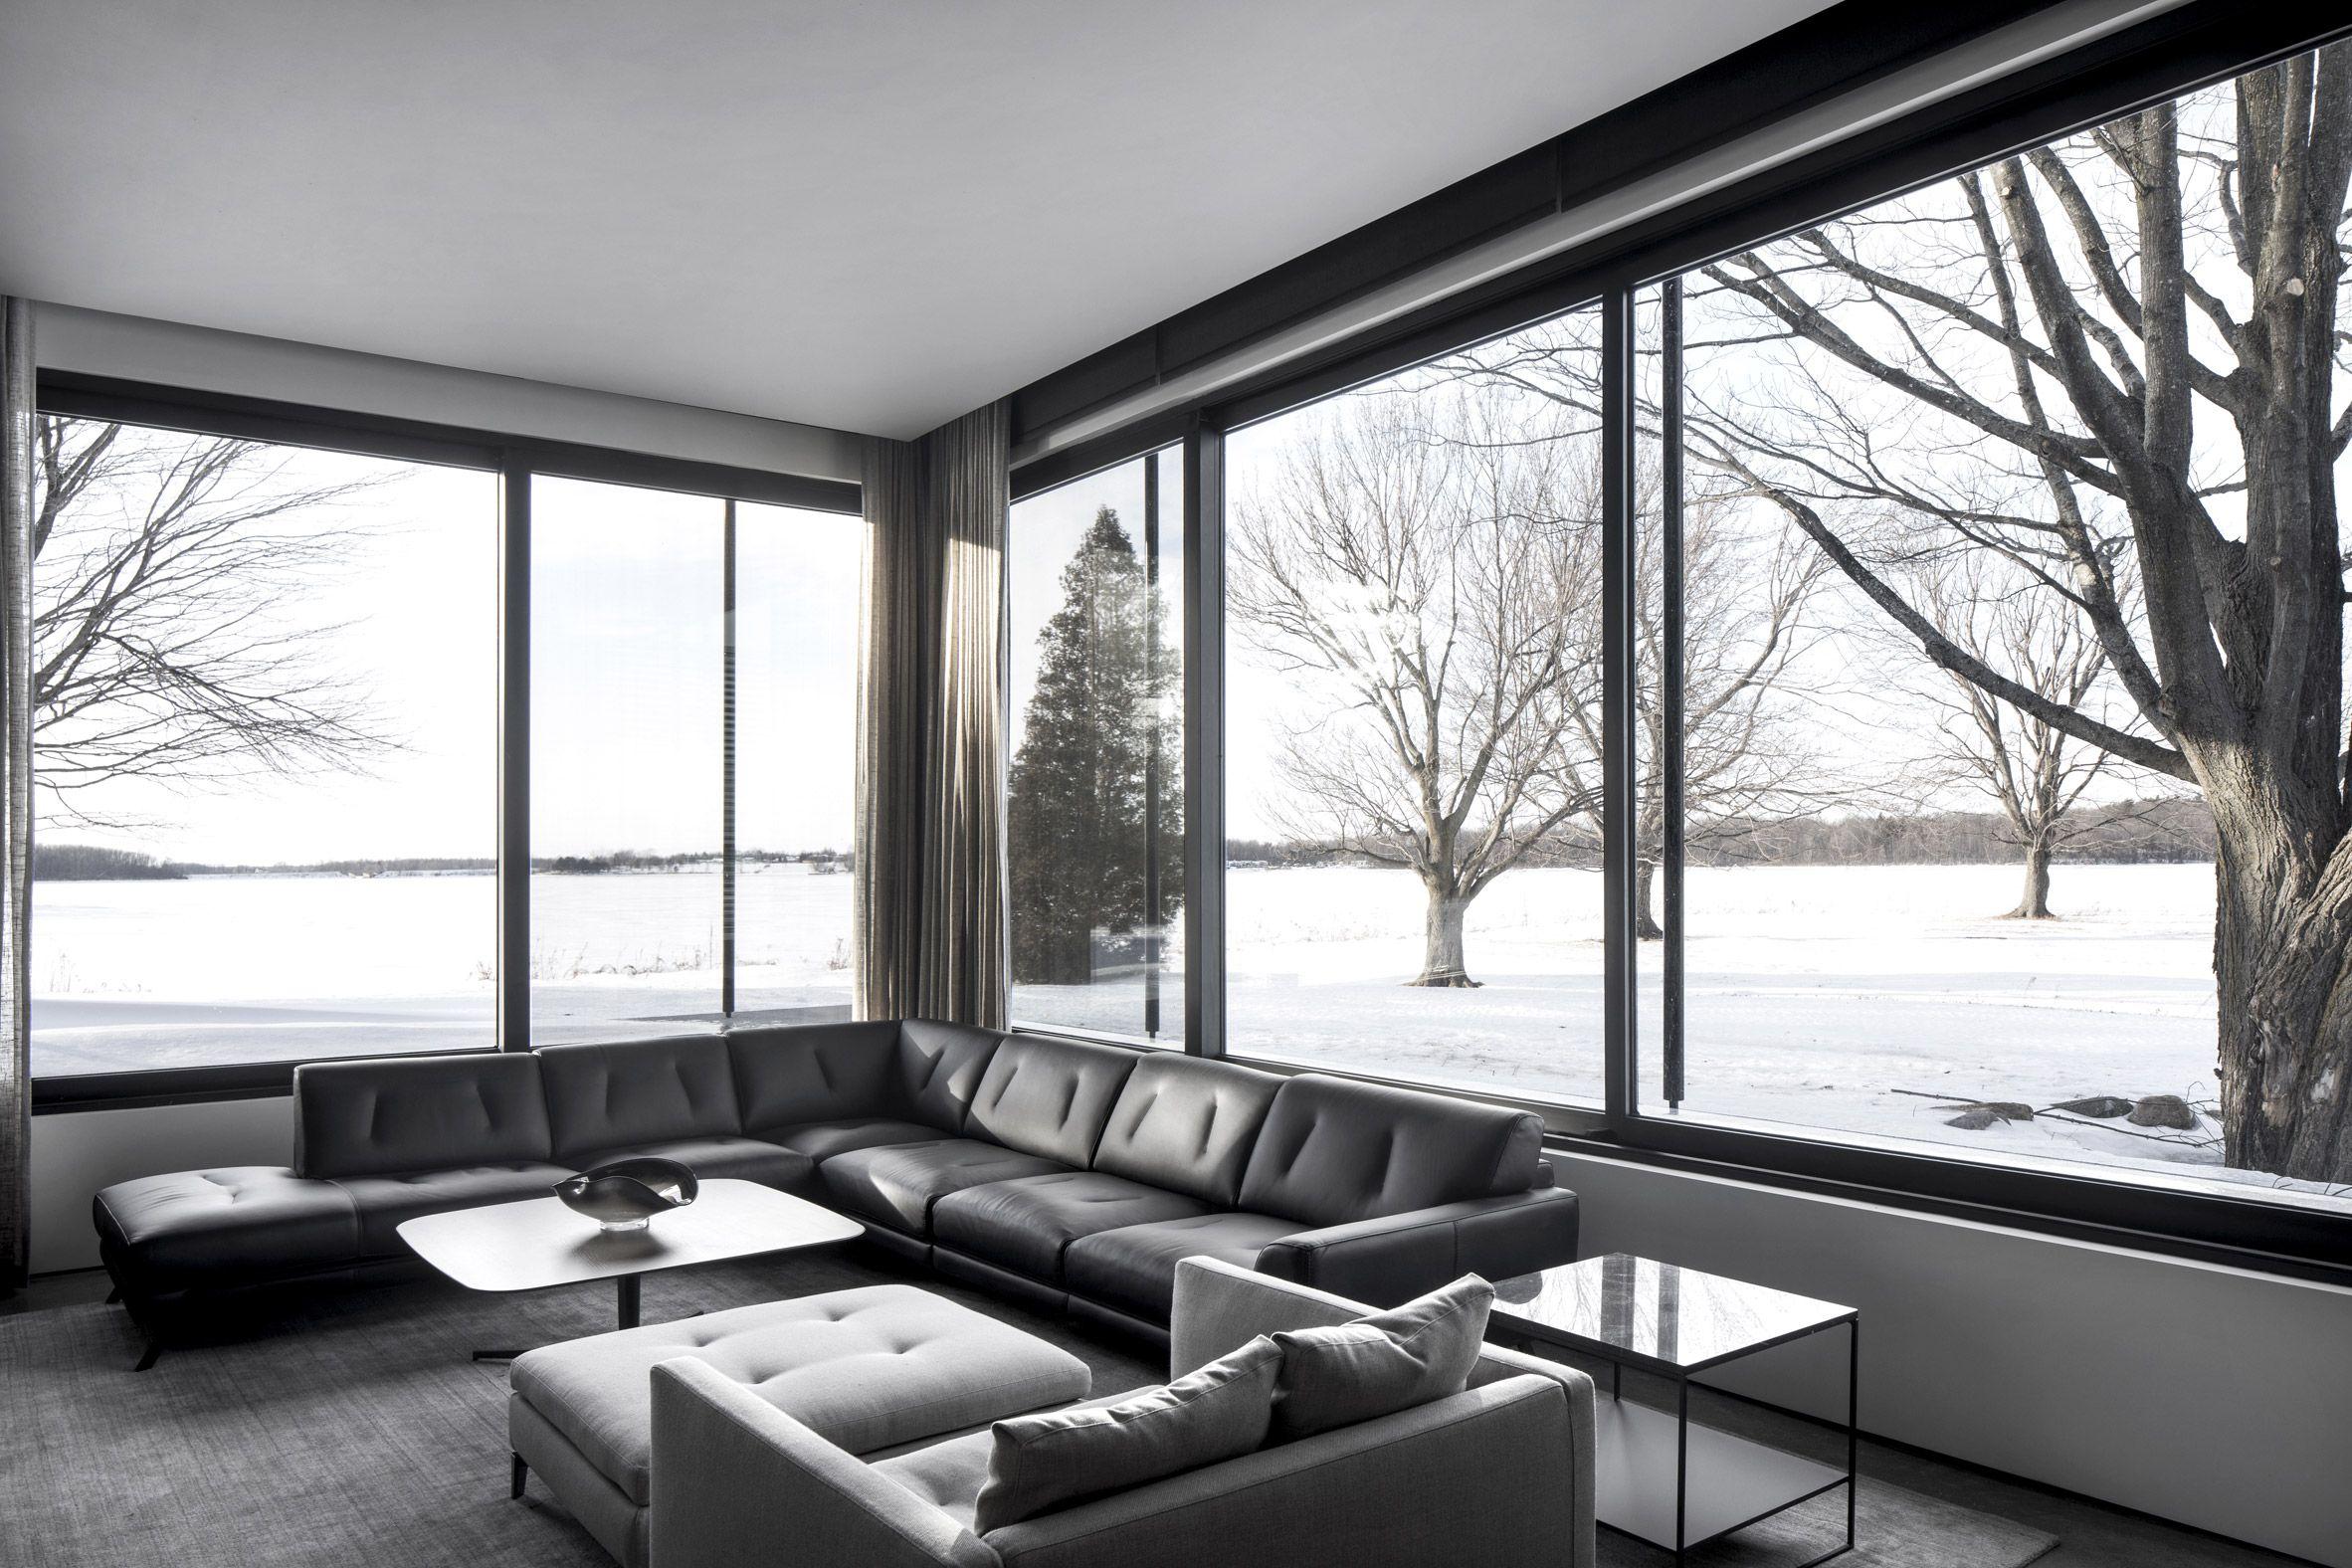 True north by alain carle architecte interj in 2018 pinterest